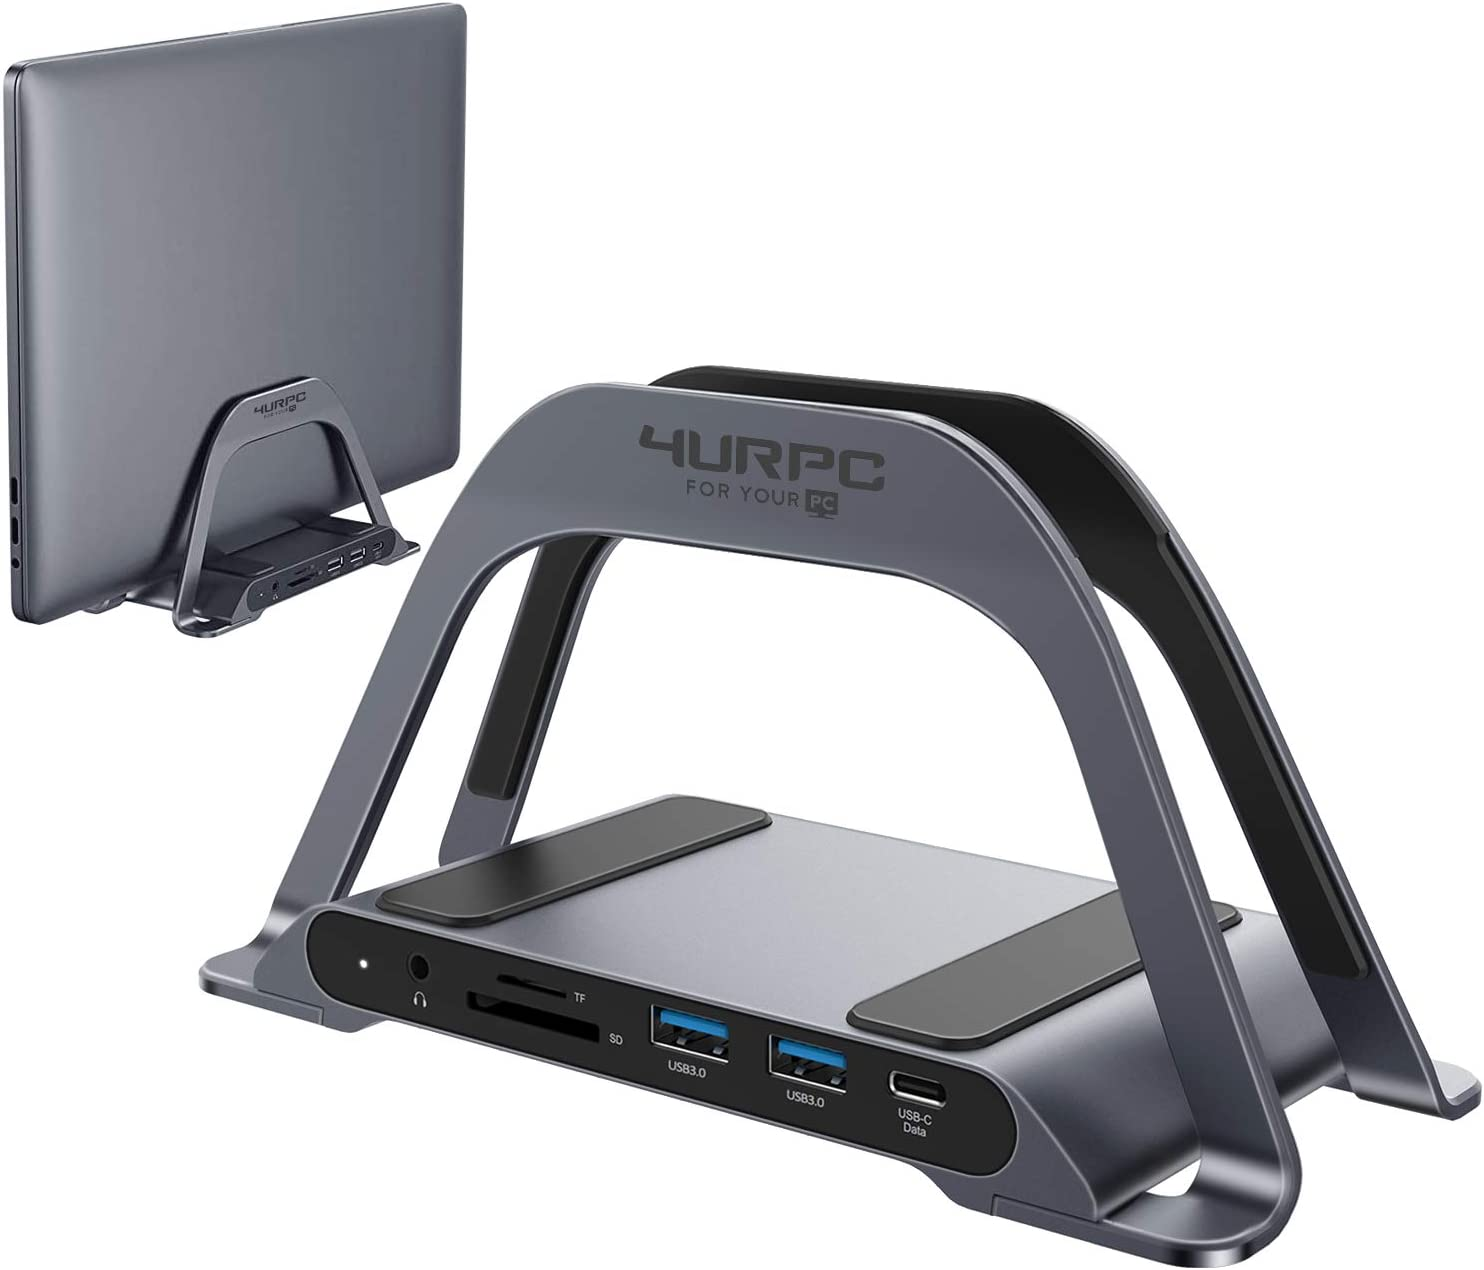 USB C Laptop Docking Station Dual Monitor, 10-Port Dual HDMI Monitor USB C Dock Stand with 2 HDMI, 3 USB, SD/TF, USB C 87W Charging, RJ45 Ethernet, 3.5mm Audio, USB C Docking Station for USB C Laptops